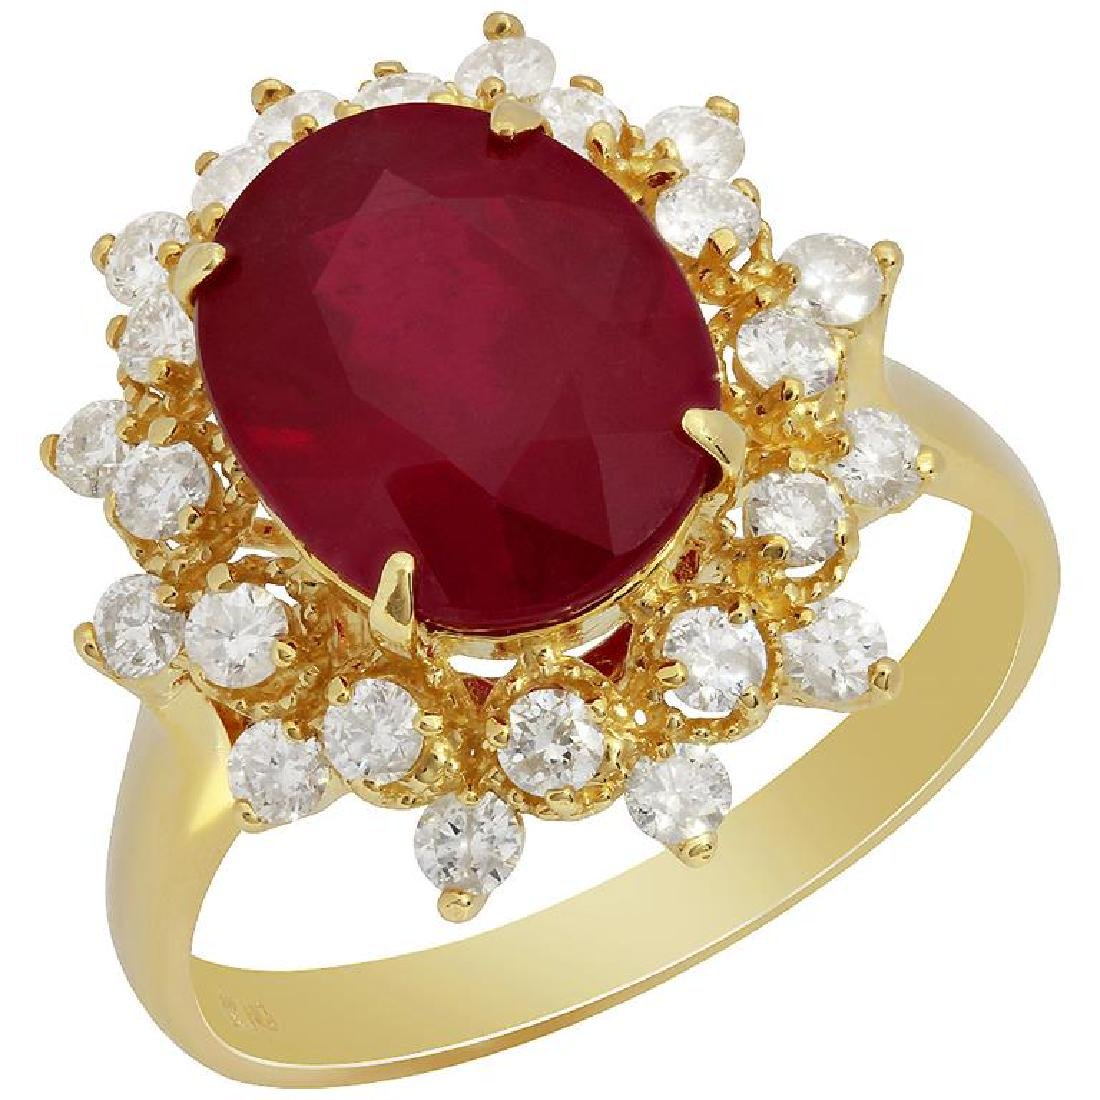 14k Yellow Gold 5.07ct Ruby 0.73ct Diamond Ring